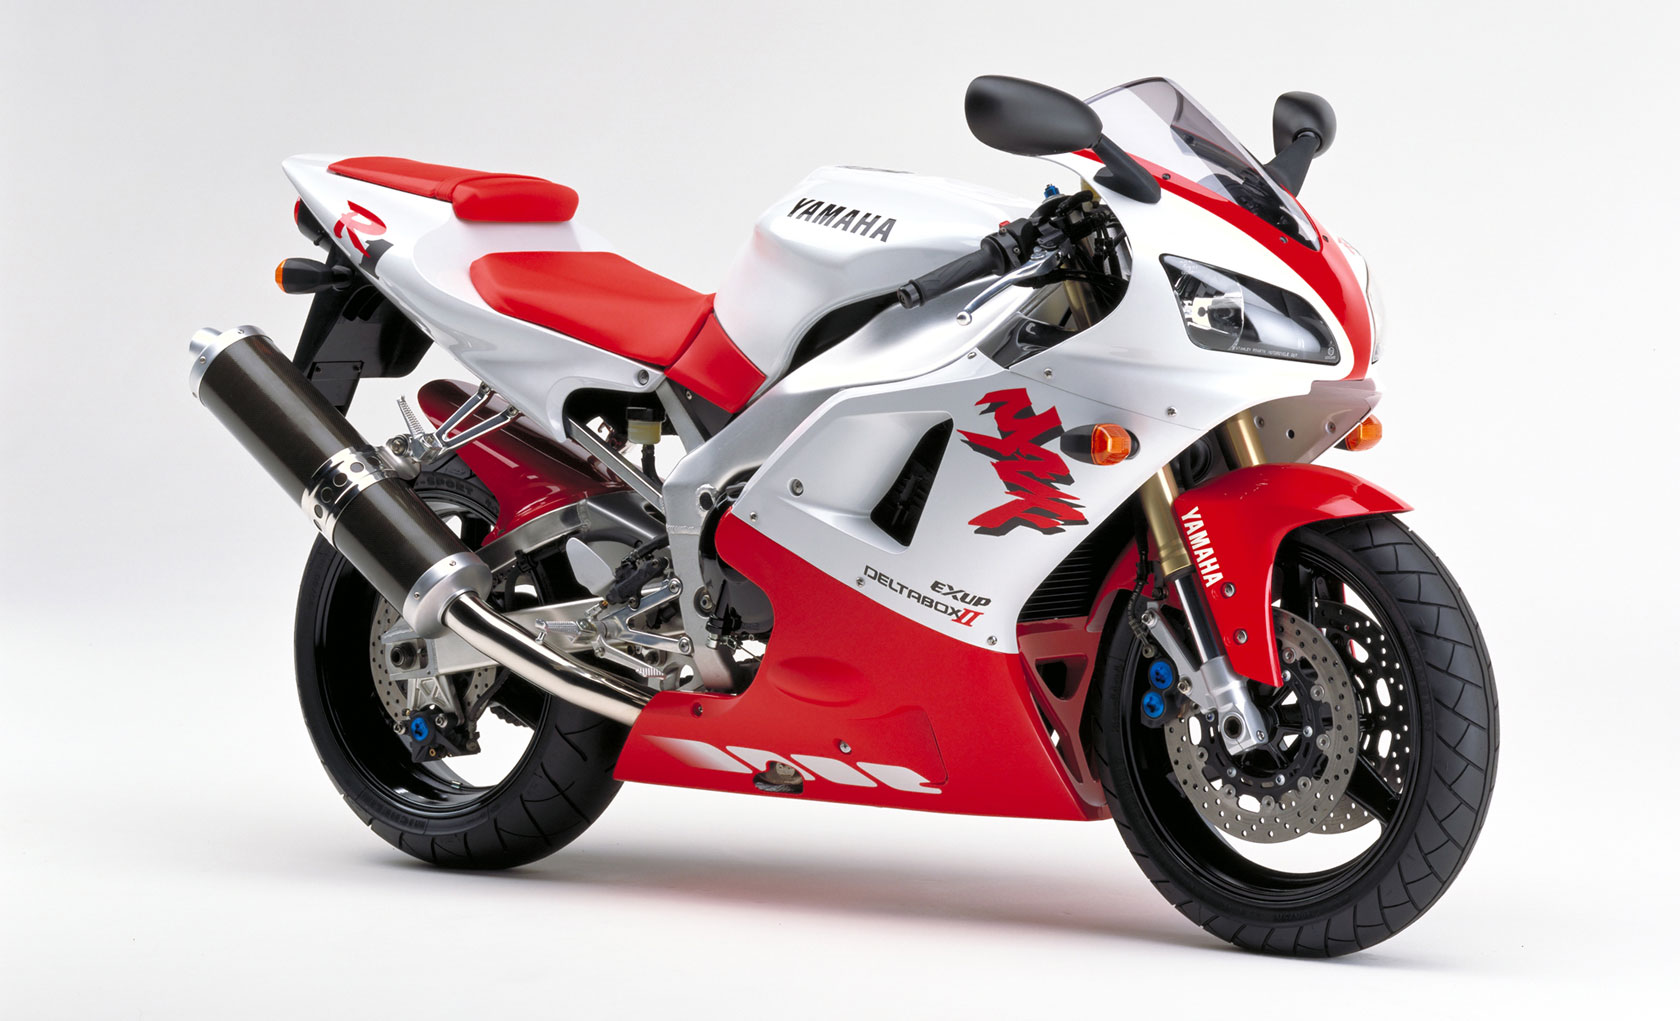 90s Sports Bikes - Yamaha R1